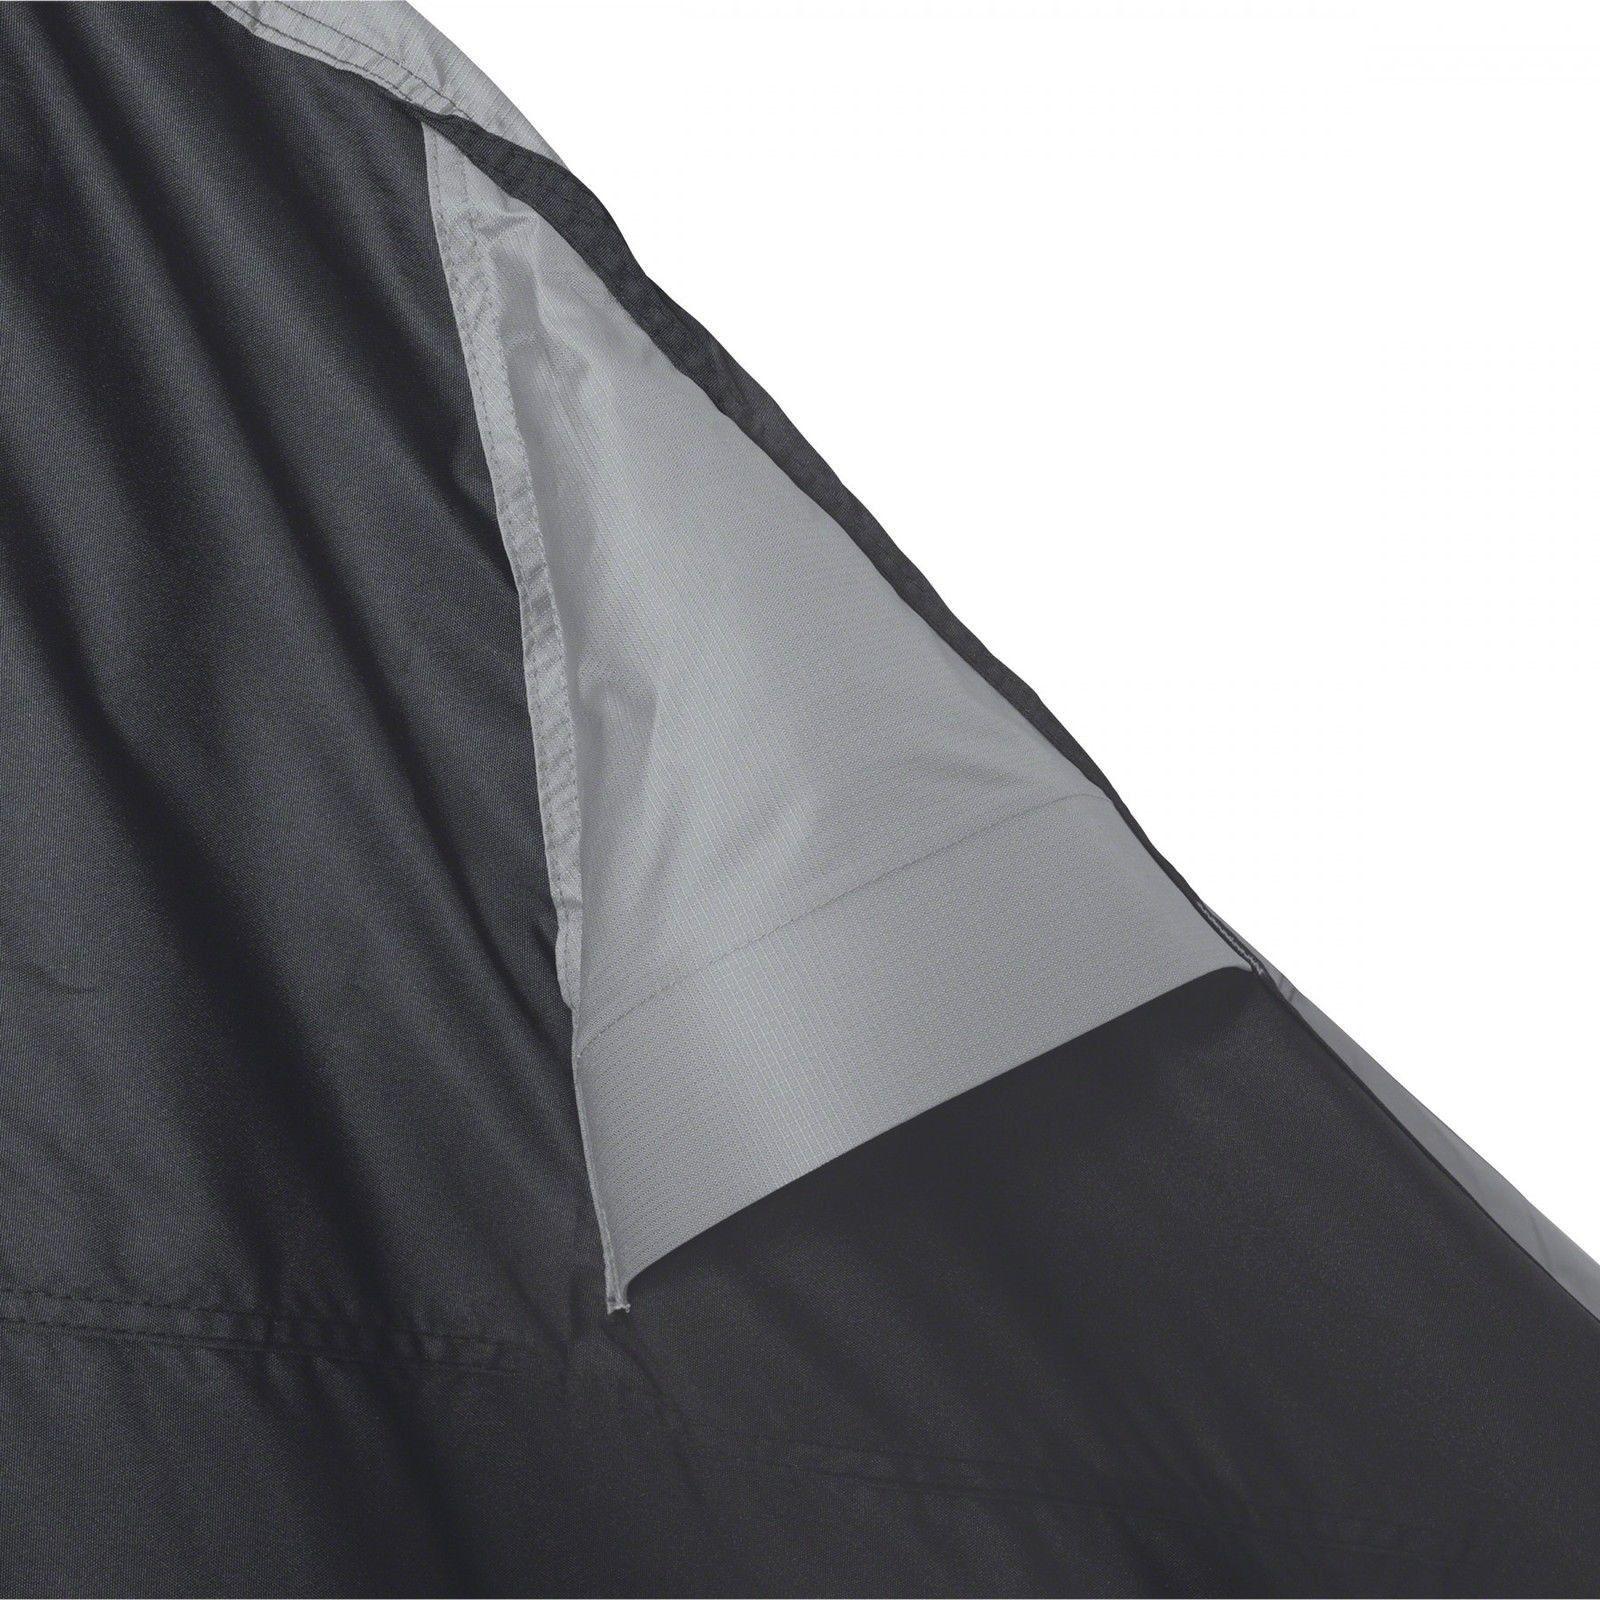 atv-covers-vent